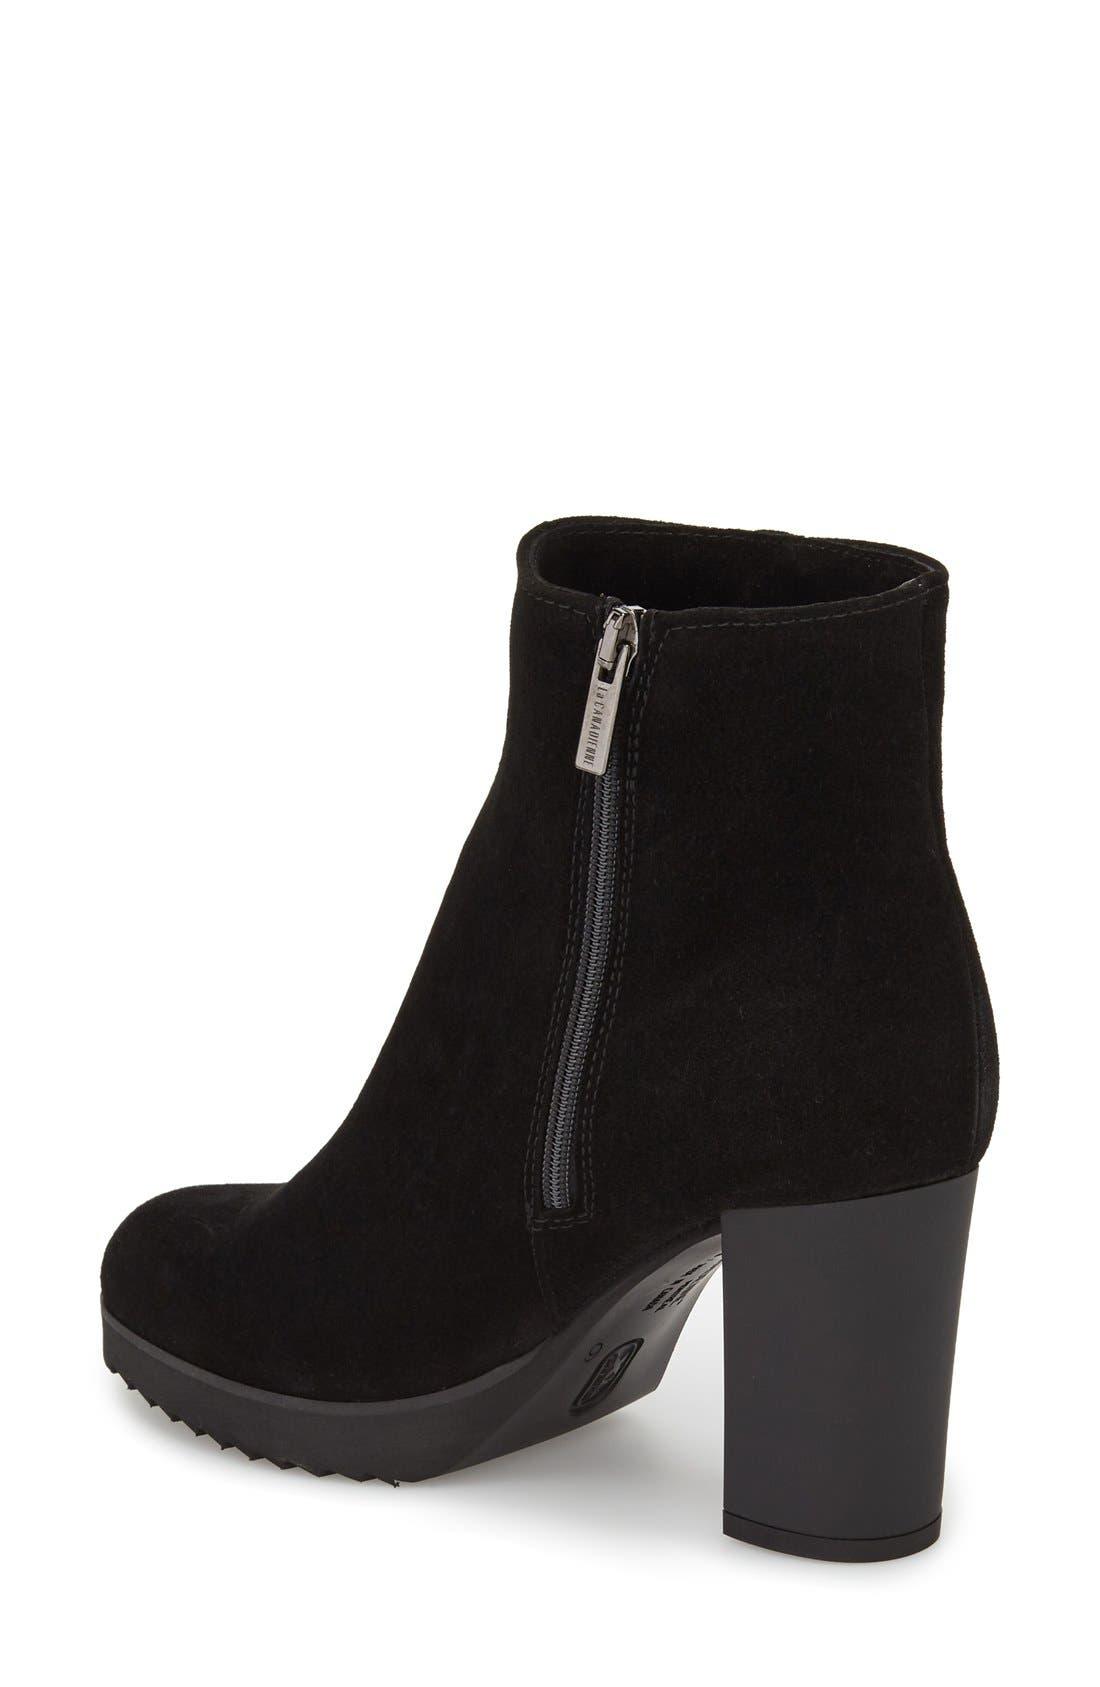 Alternate Image 2  - La Canadienne 'Myranda' Waterproof Block Heel Bootie (Women)